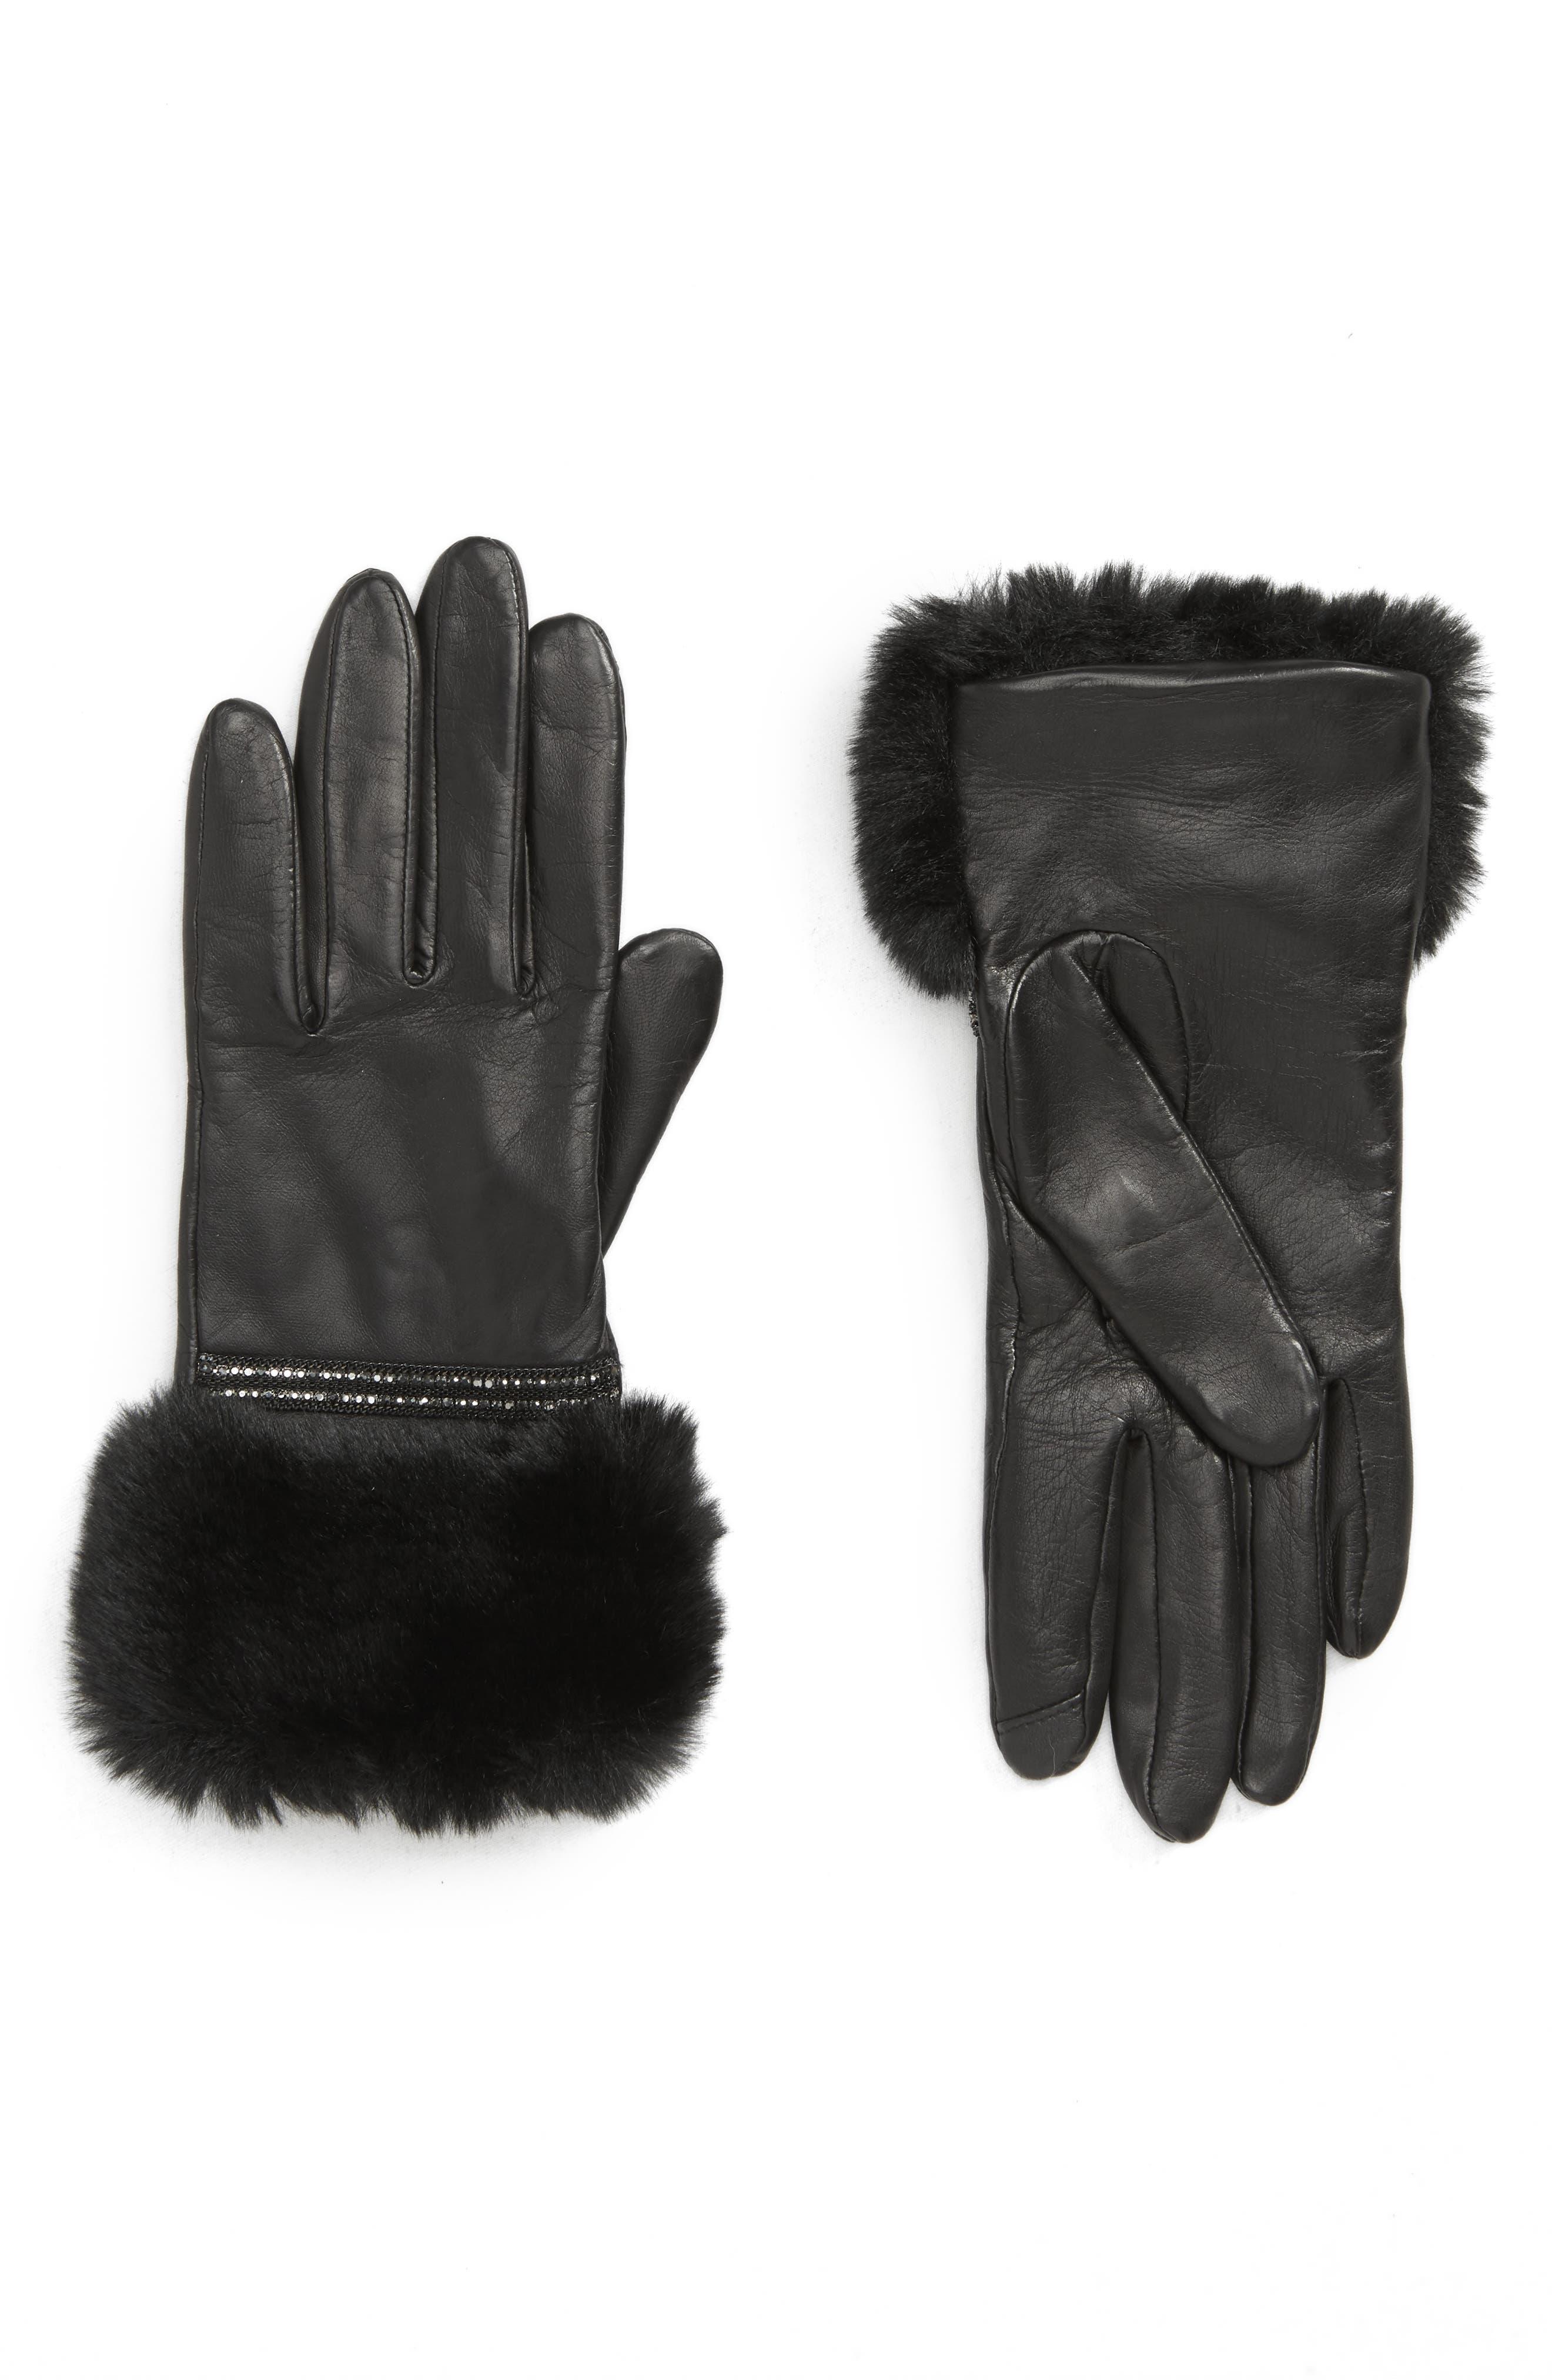 Badgley Mischka Faux Fur Trim Leather Touchscreen Gloves,                             Main thumbnail 1, color,                             BLACK